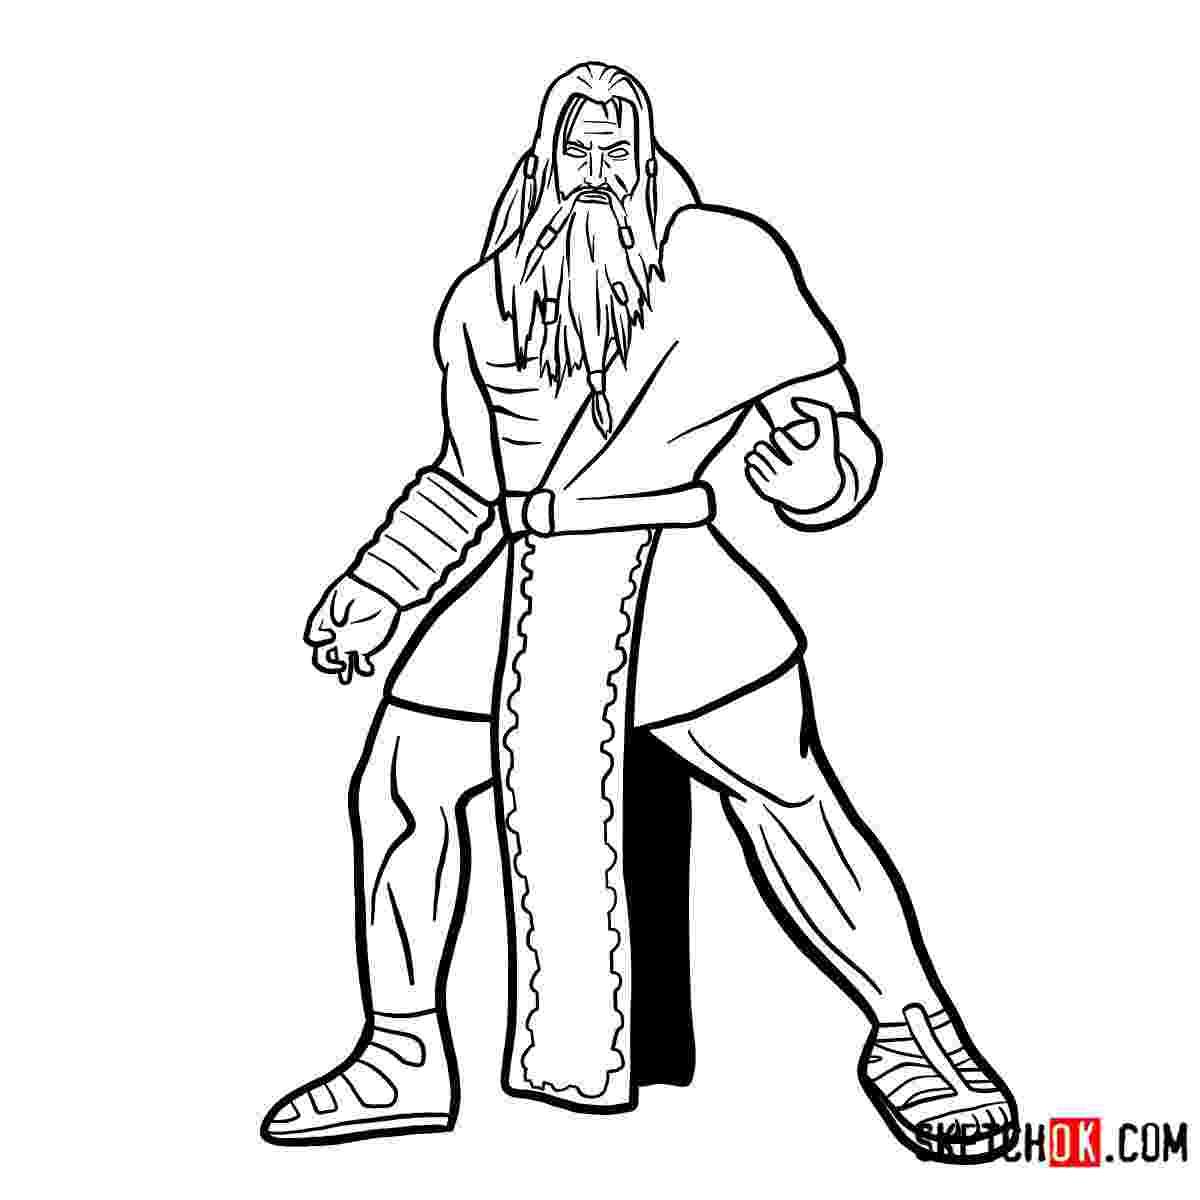 sketch of zeus how to draw zeus god of war step by step drawing tutorials zeus of sketch